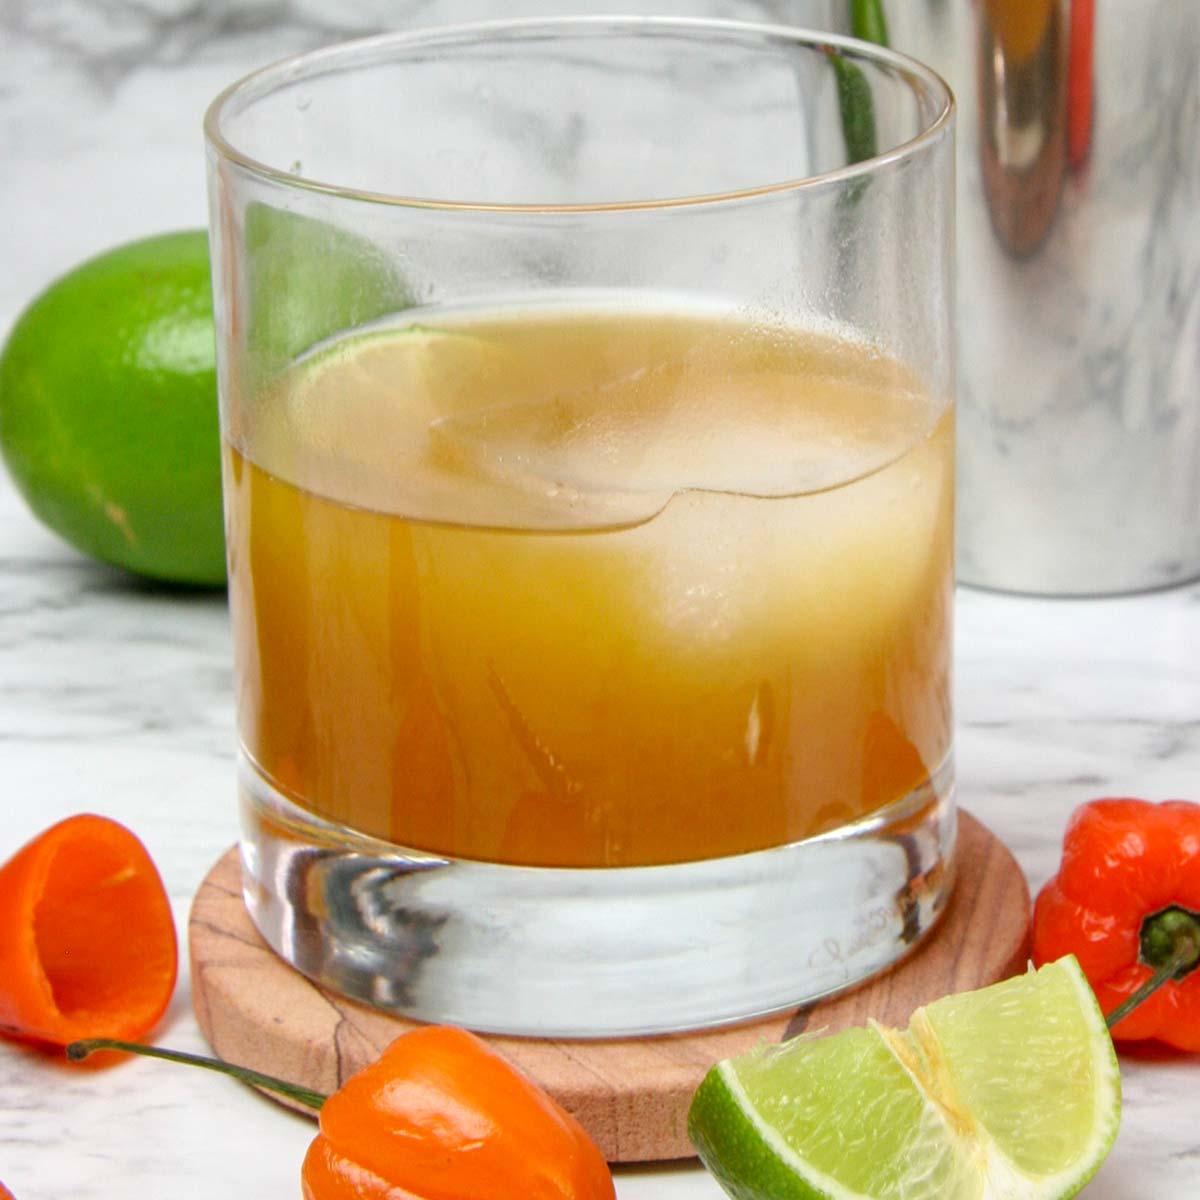 Habanero-Infused Whiskey with Mango and Lime